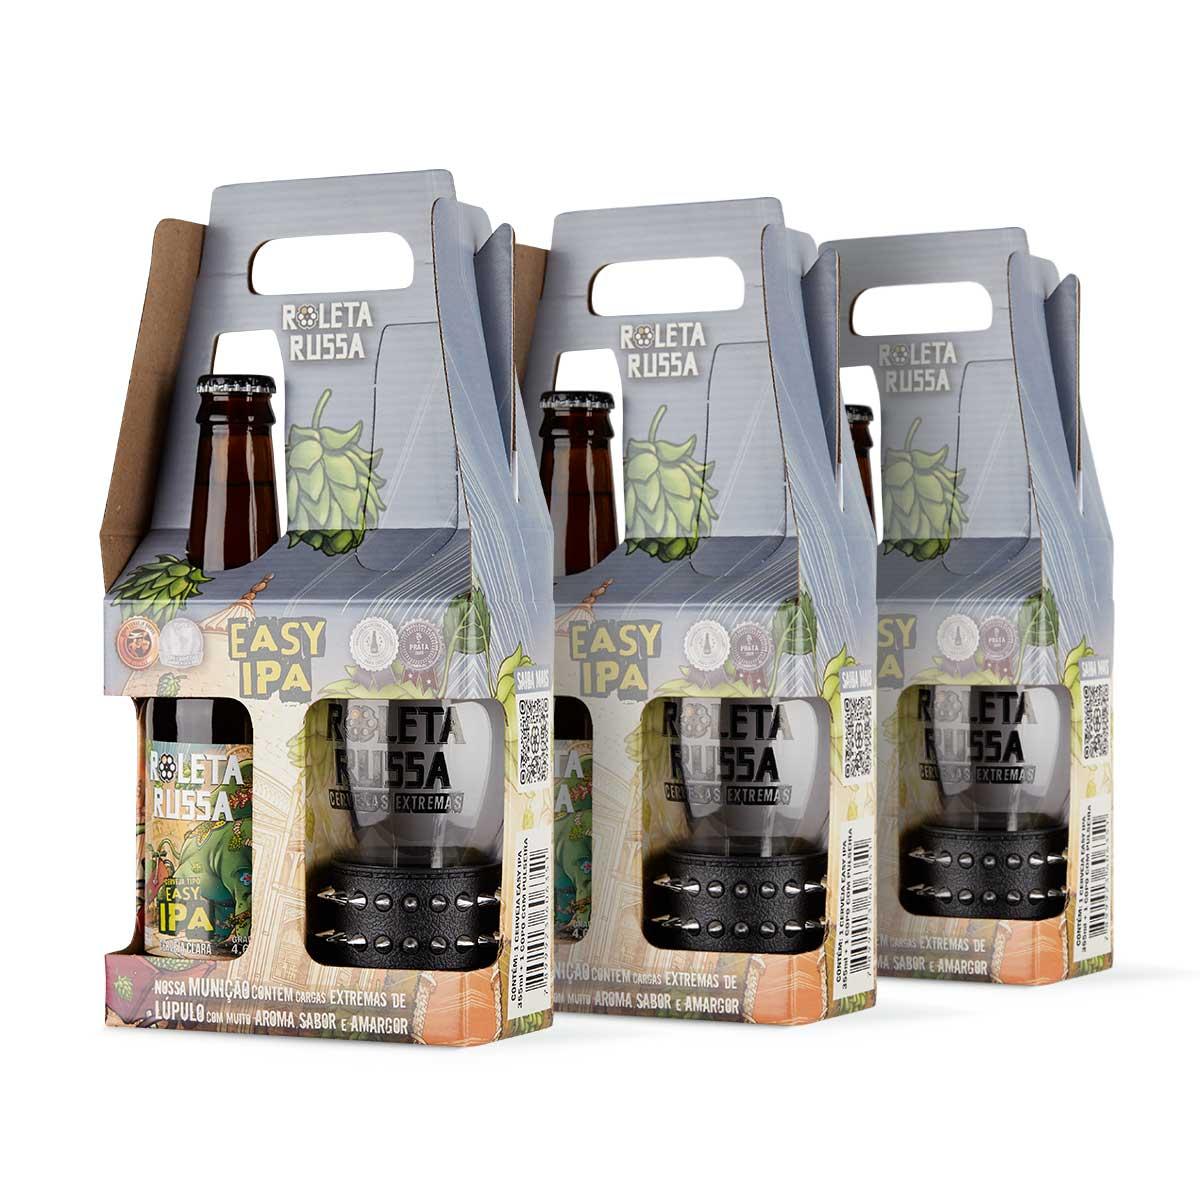 Pack 3 kit presente cerveja Roleta Russa Easy IPA 355 ml + copo 320 ml com pulseira